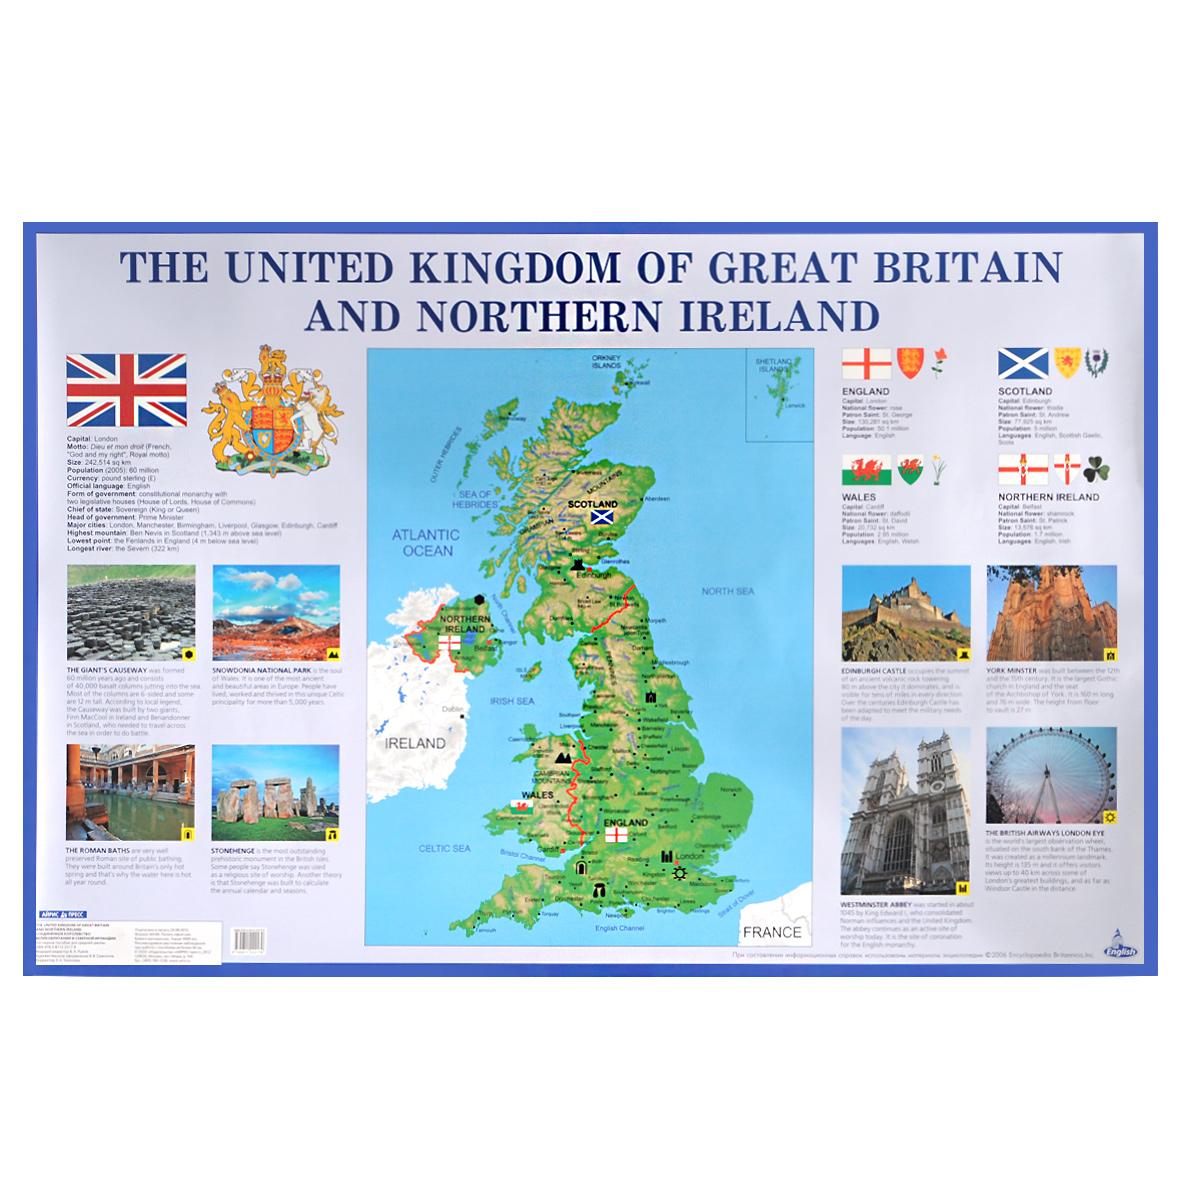 The United Kingdom of Great Britain and Northern Ireland / Соединенное Королевство Великобритании и Северной Ирландии . Наглядное пособие гацура г мебель английского классицизма хэпплуайт hepplewhite furniture of great britain